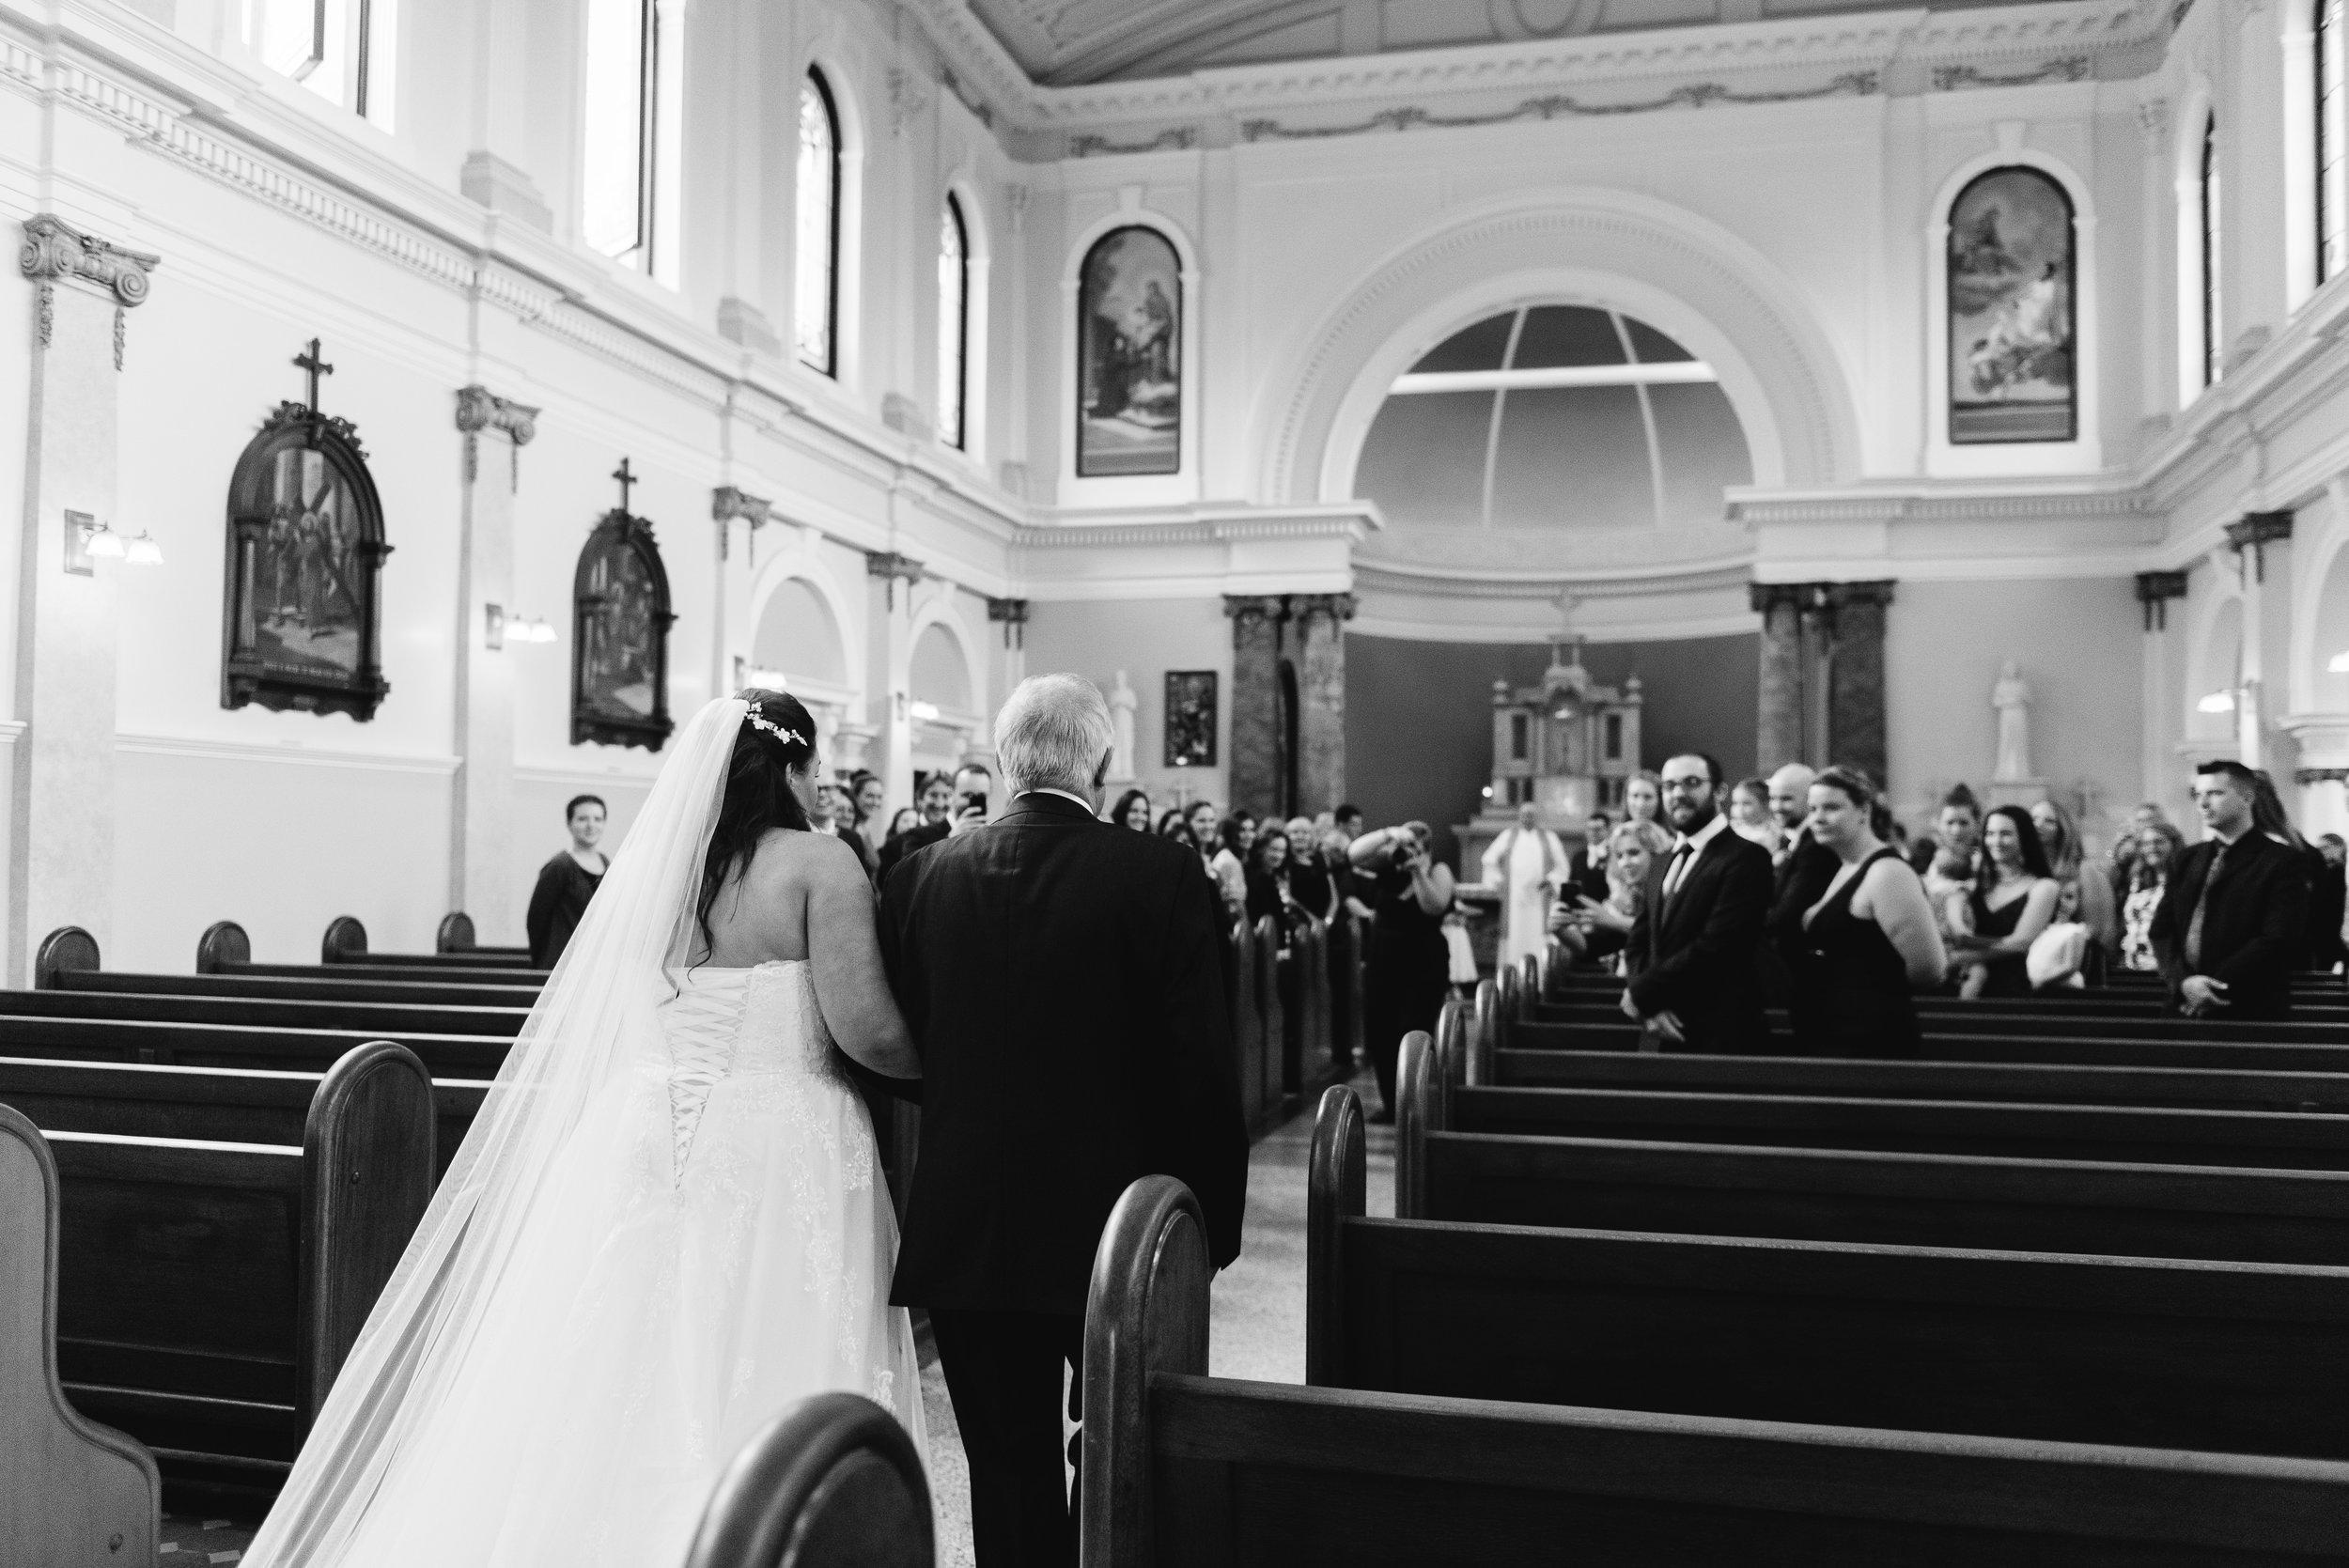 brisbane-wedding-photographer-45.jpg